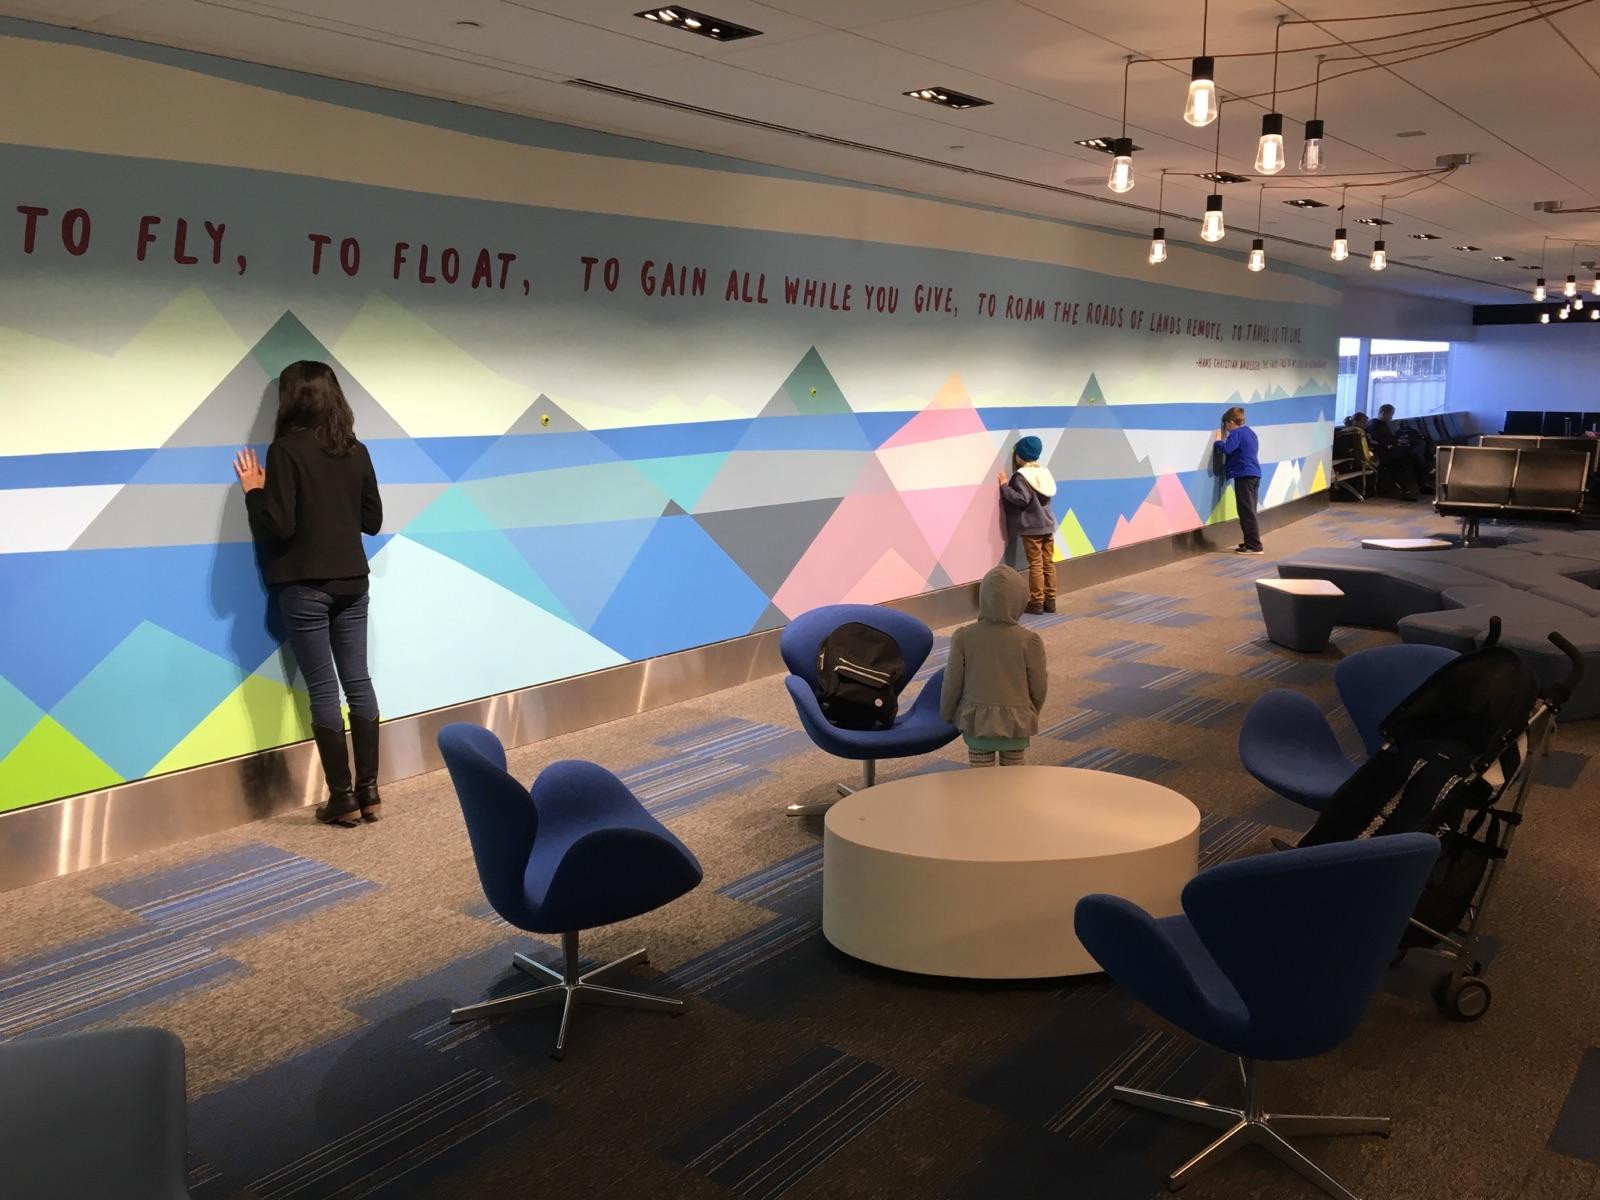 Peephole Cinema San Francisco International Airport, 2106-present